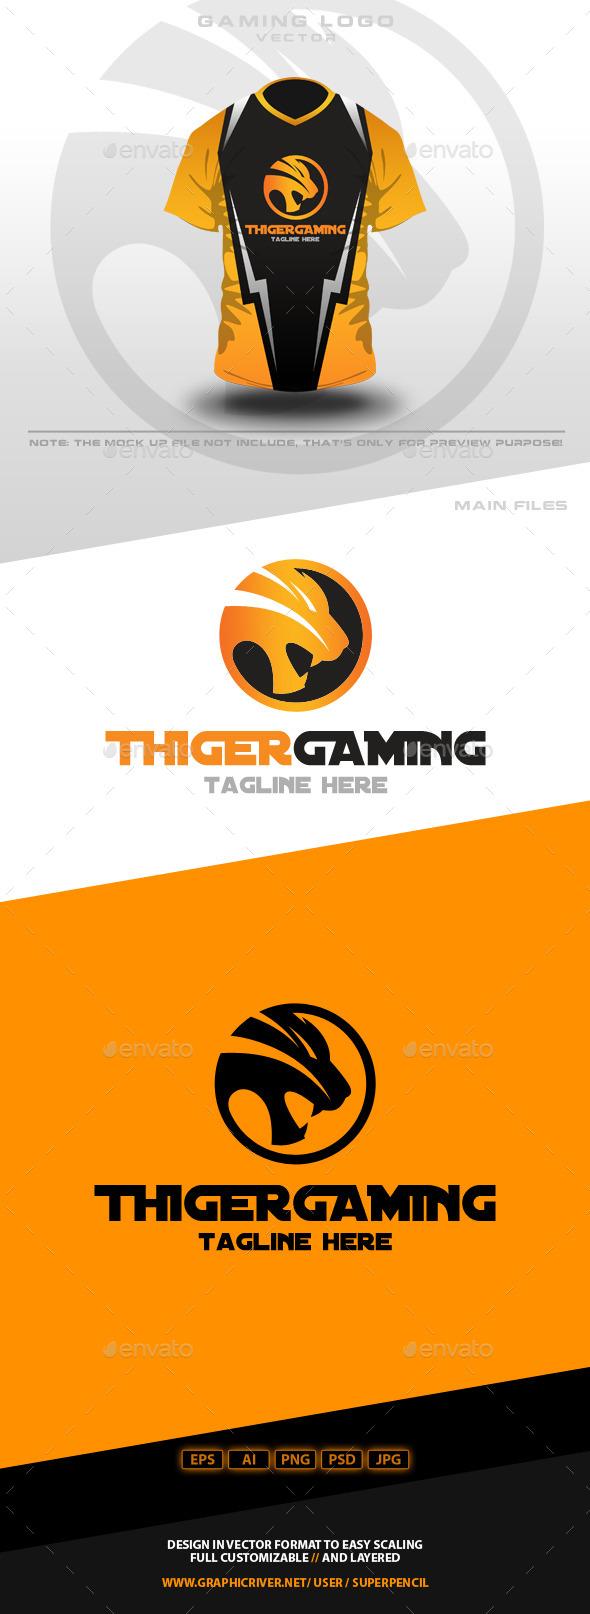 Thiger Gaming Logo - Animals Logo Templates